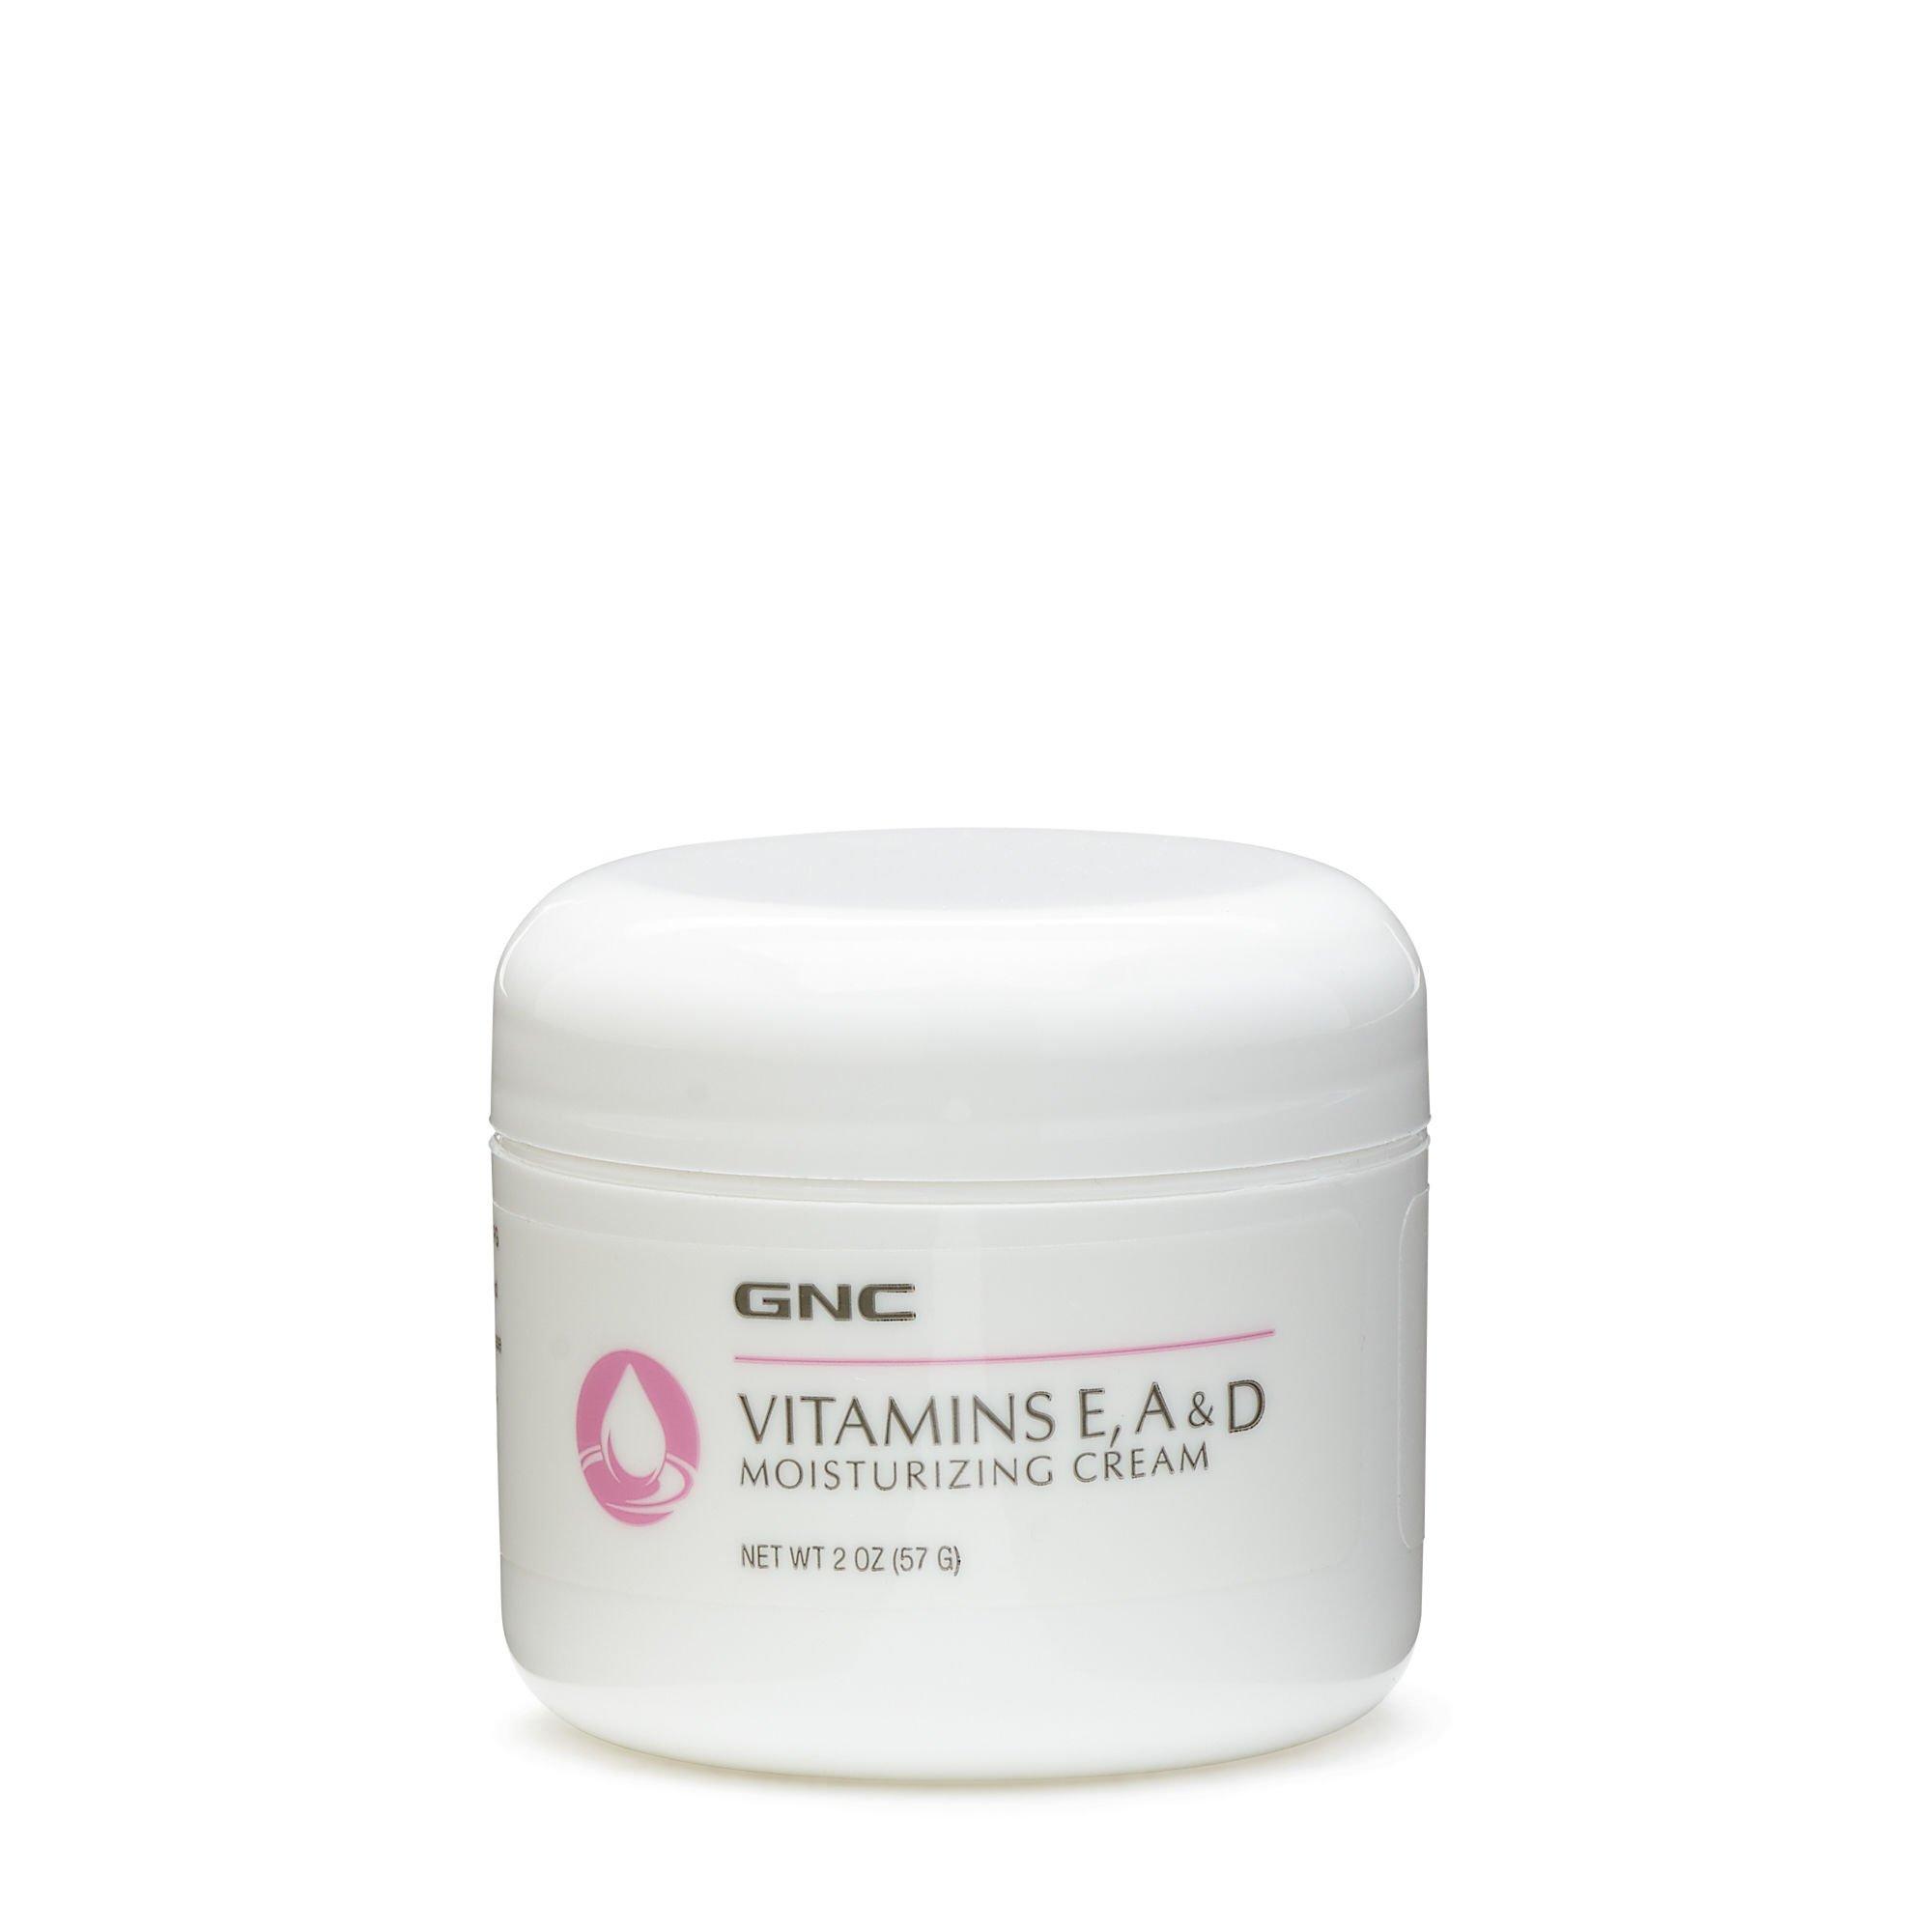 GNC Vitamins E A D Moisturizing Cream